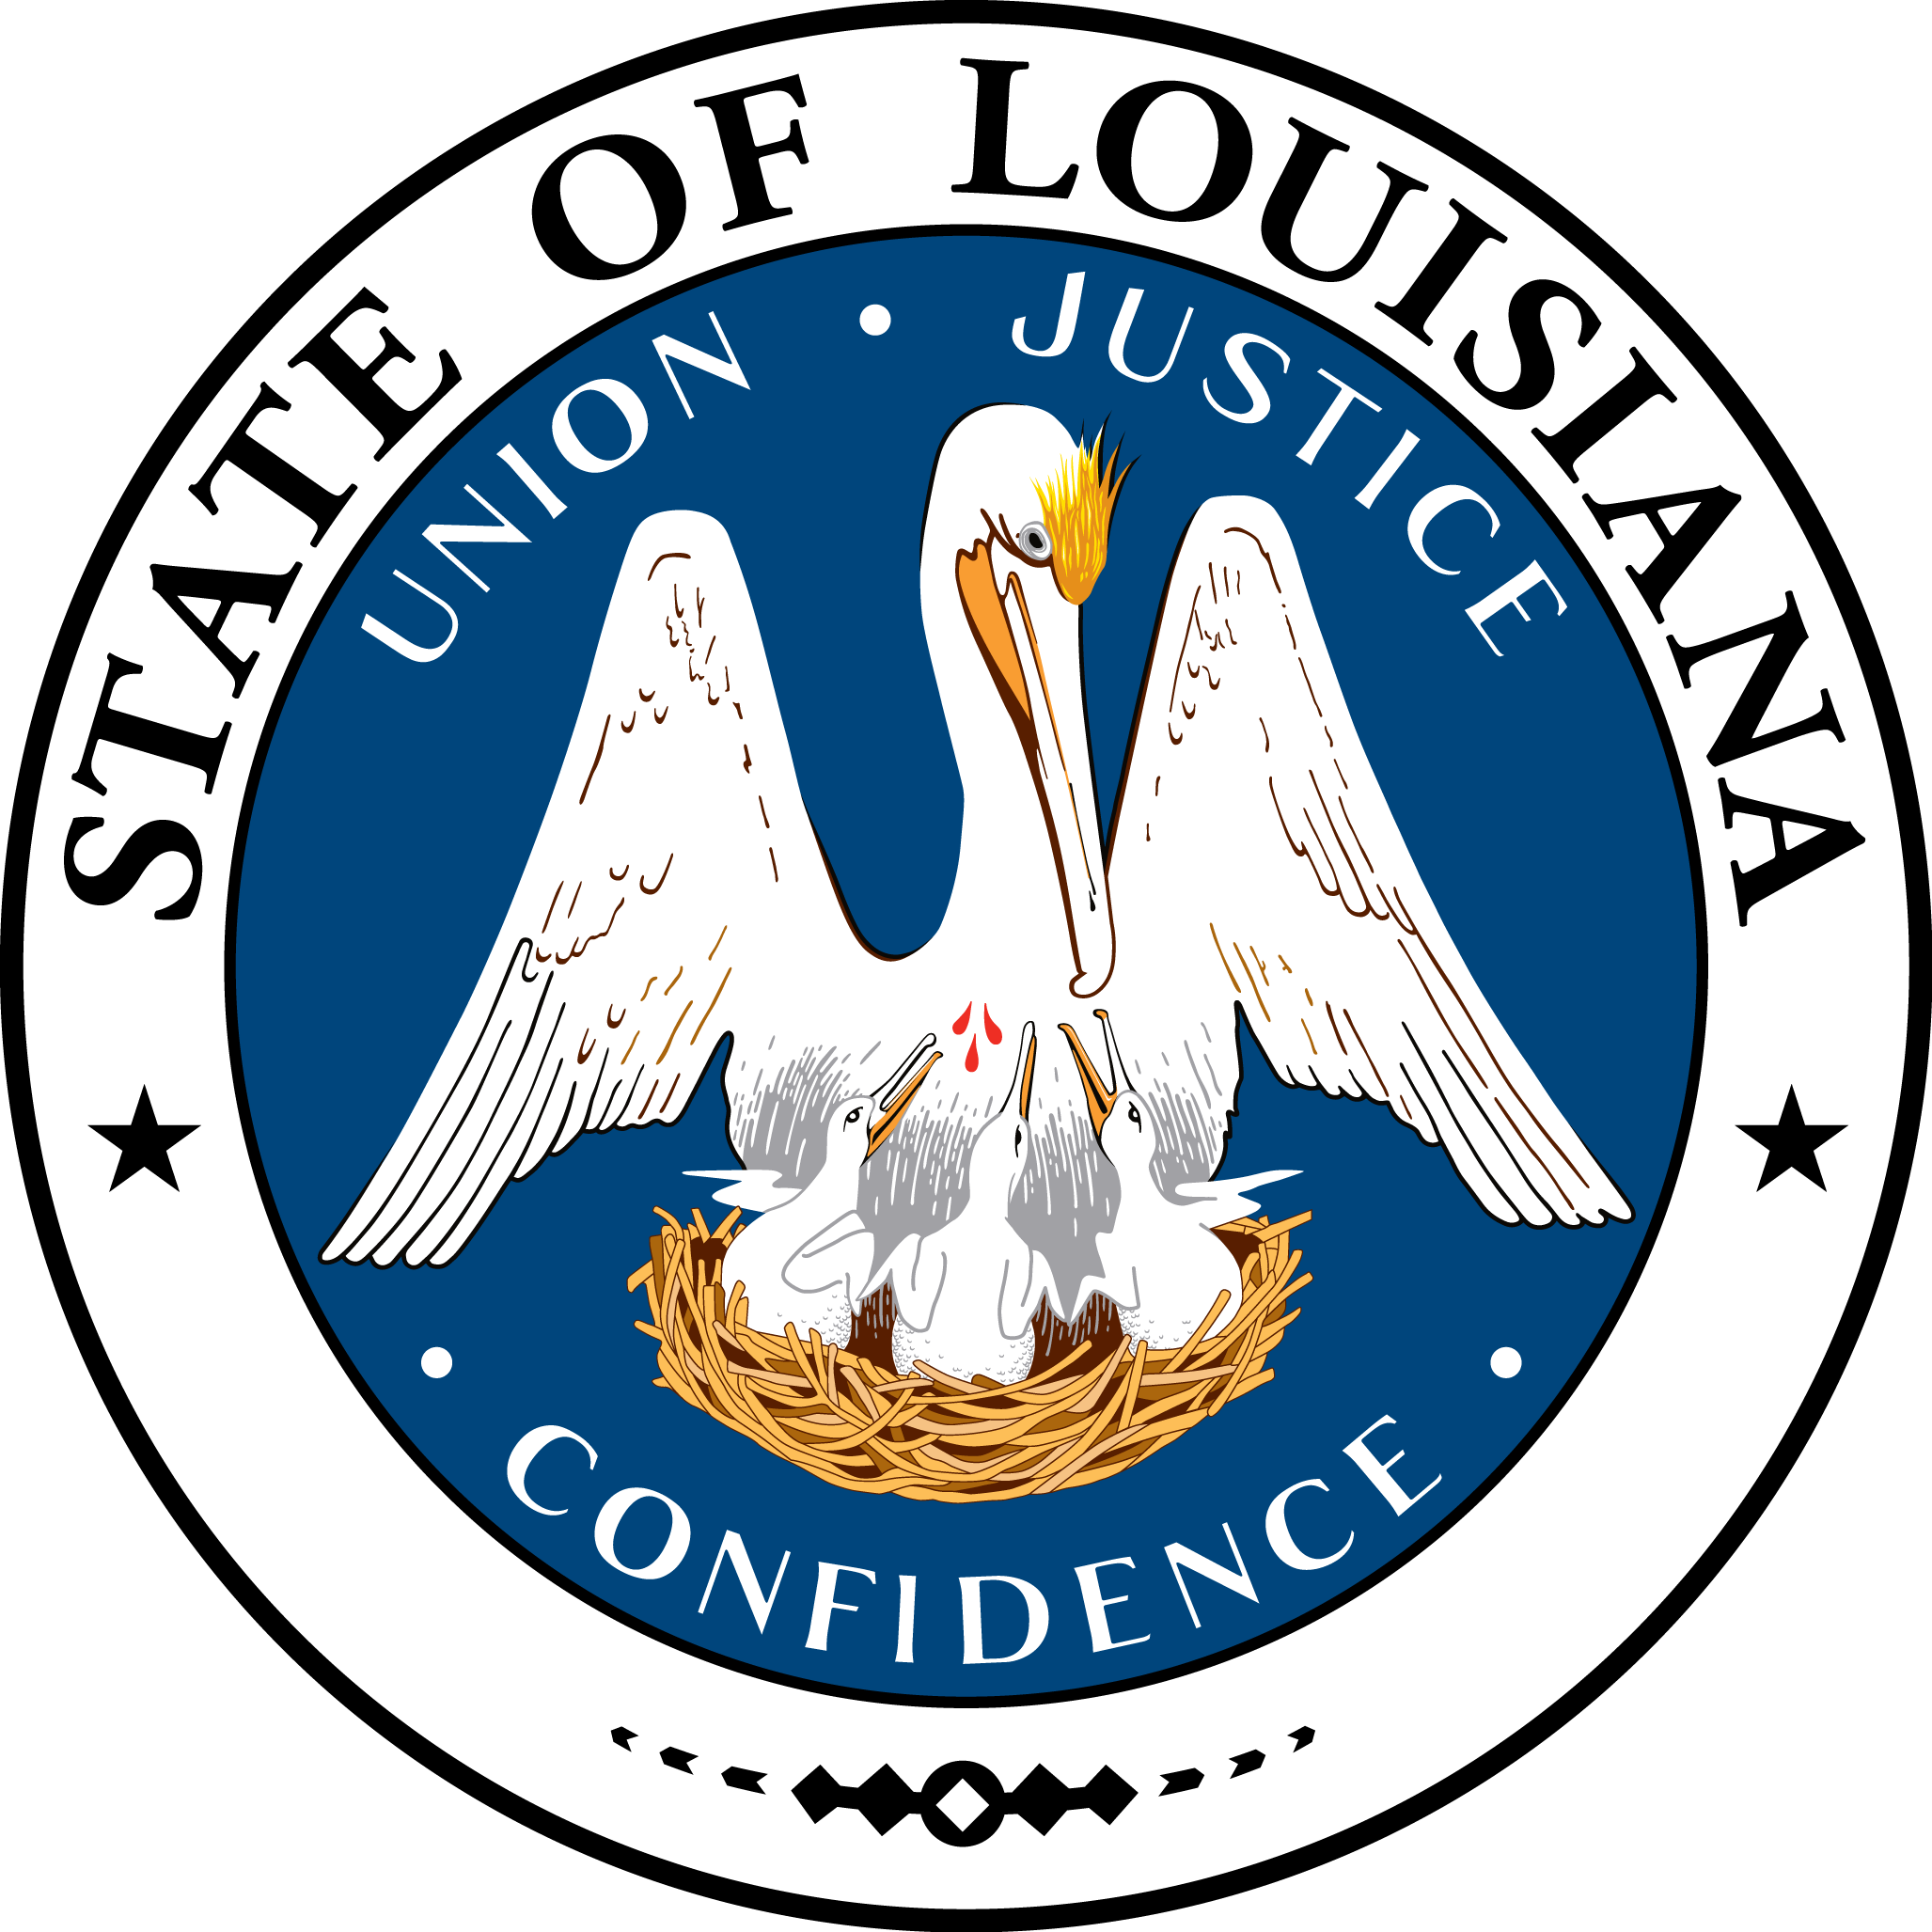 Photo source: State of Louisiana